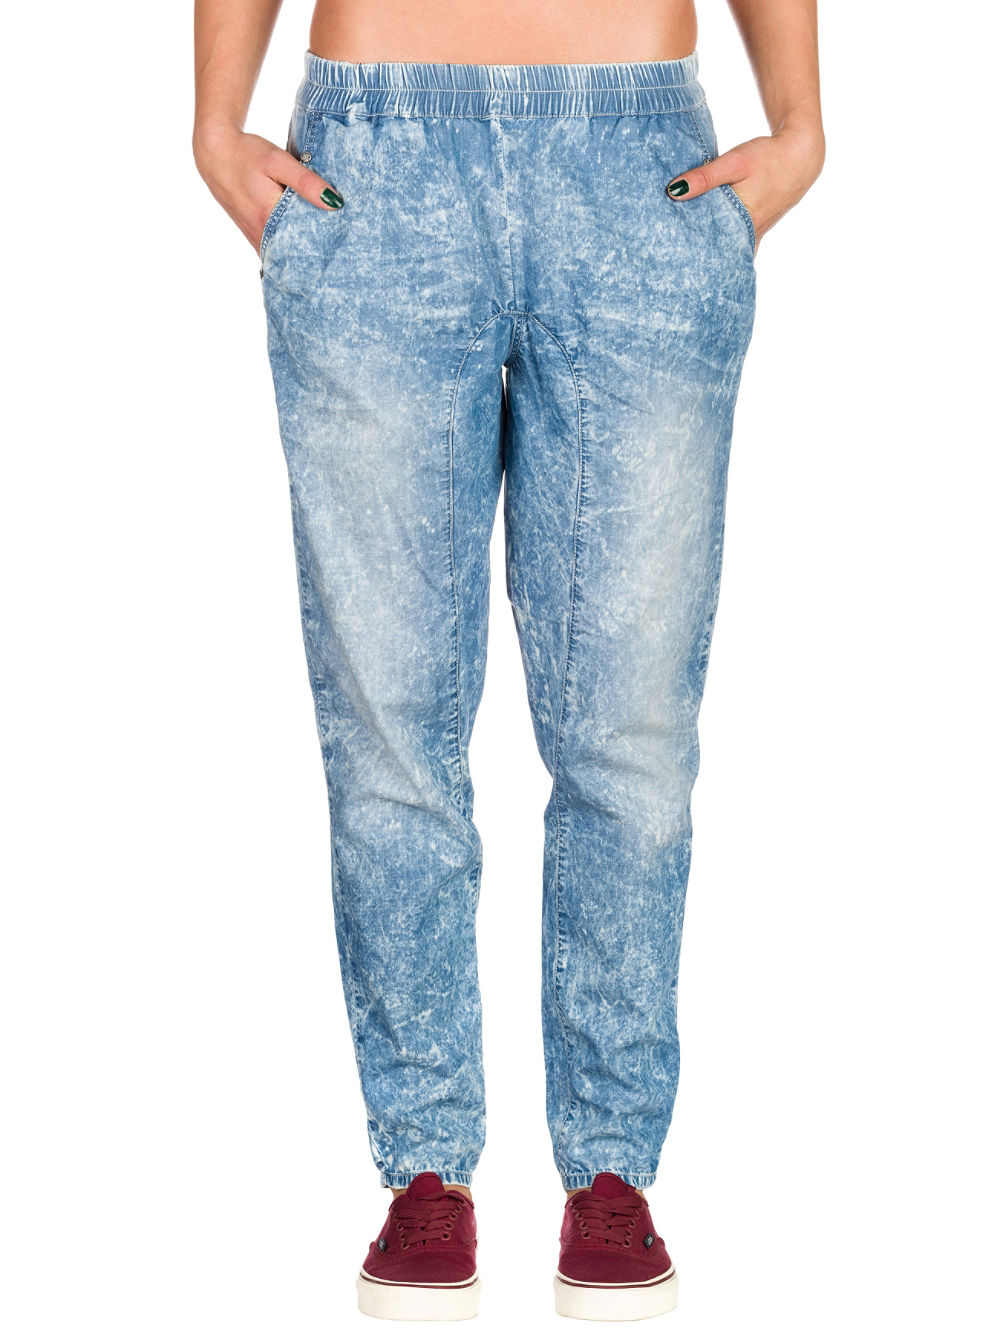 reality-slim-jeans